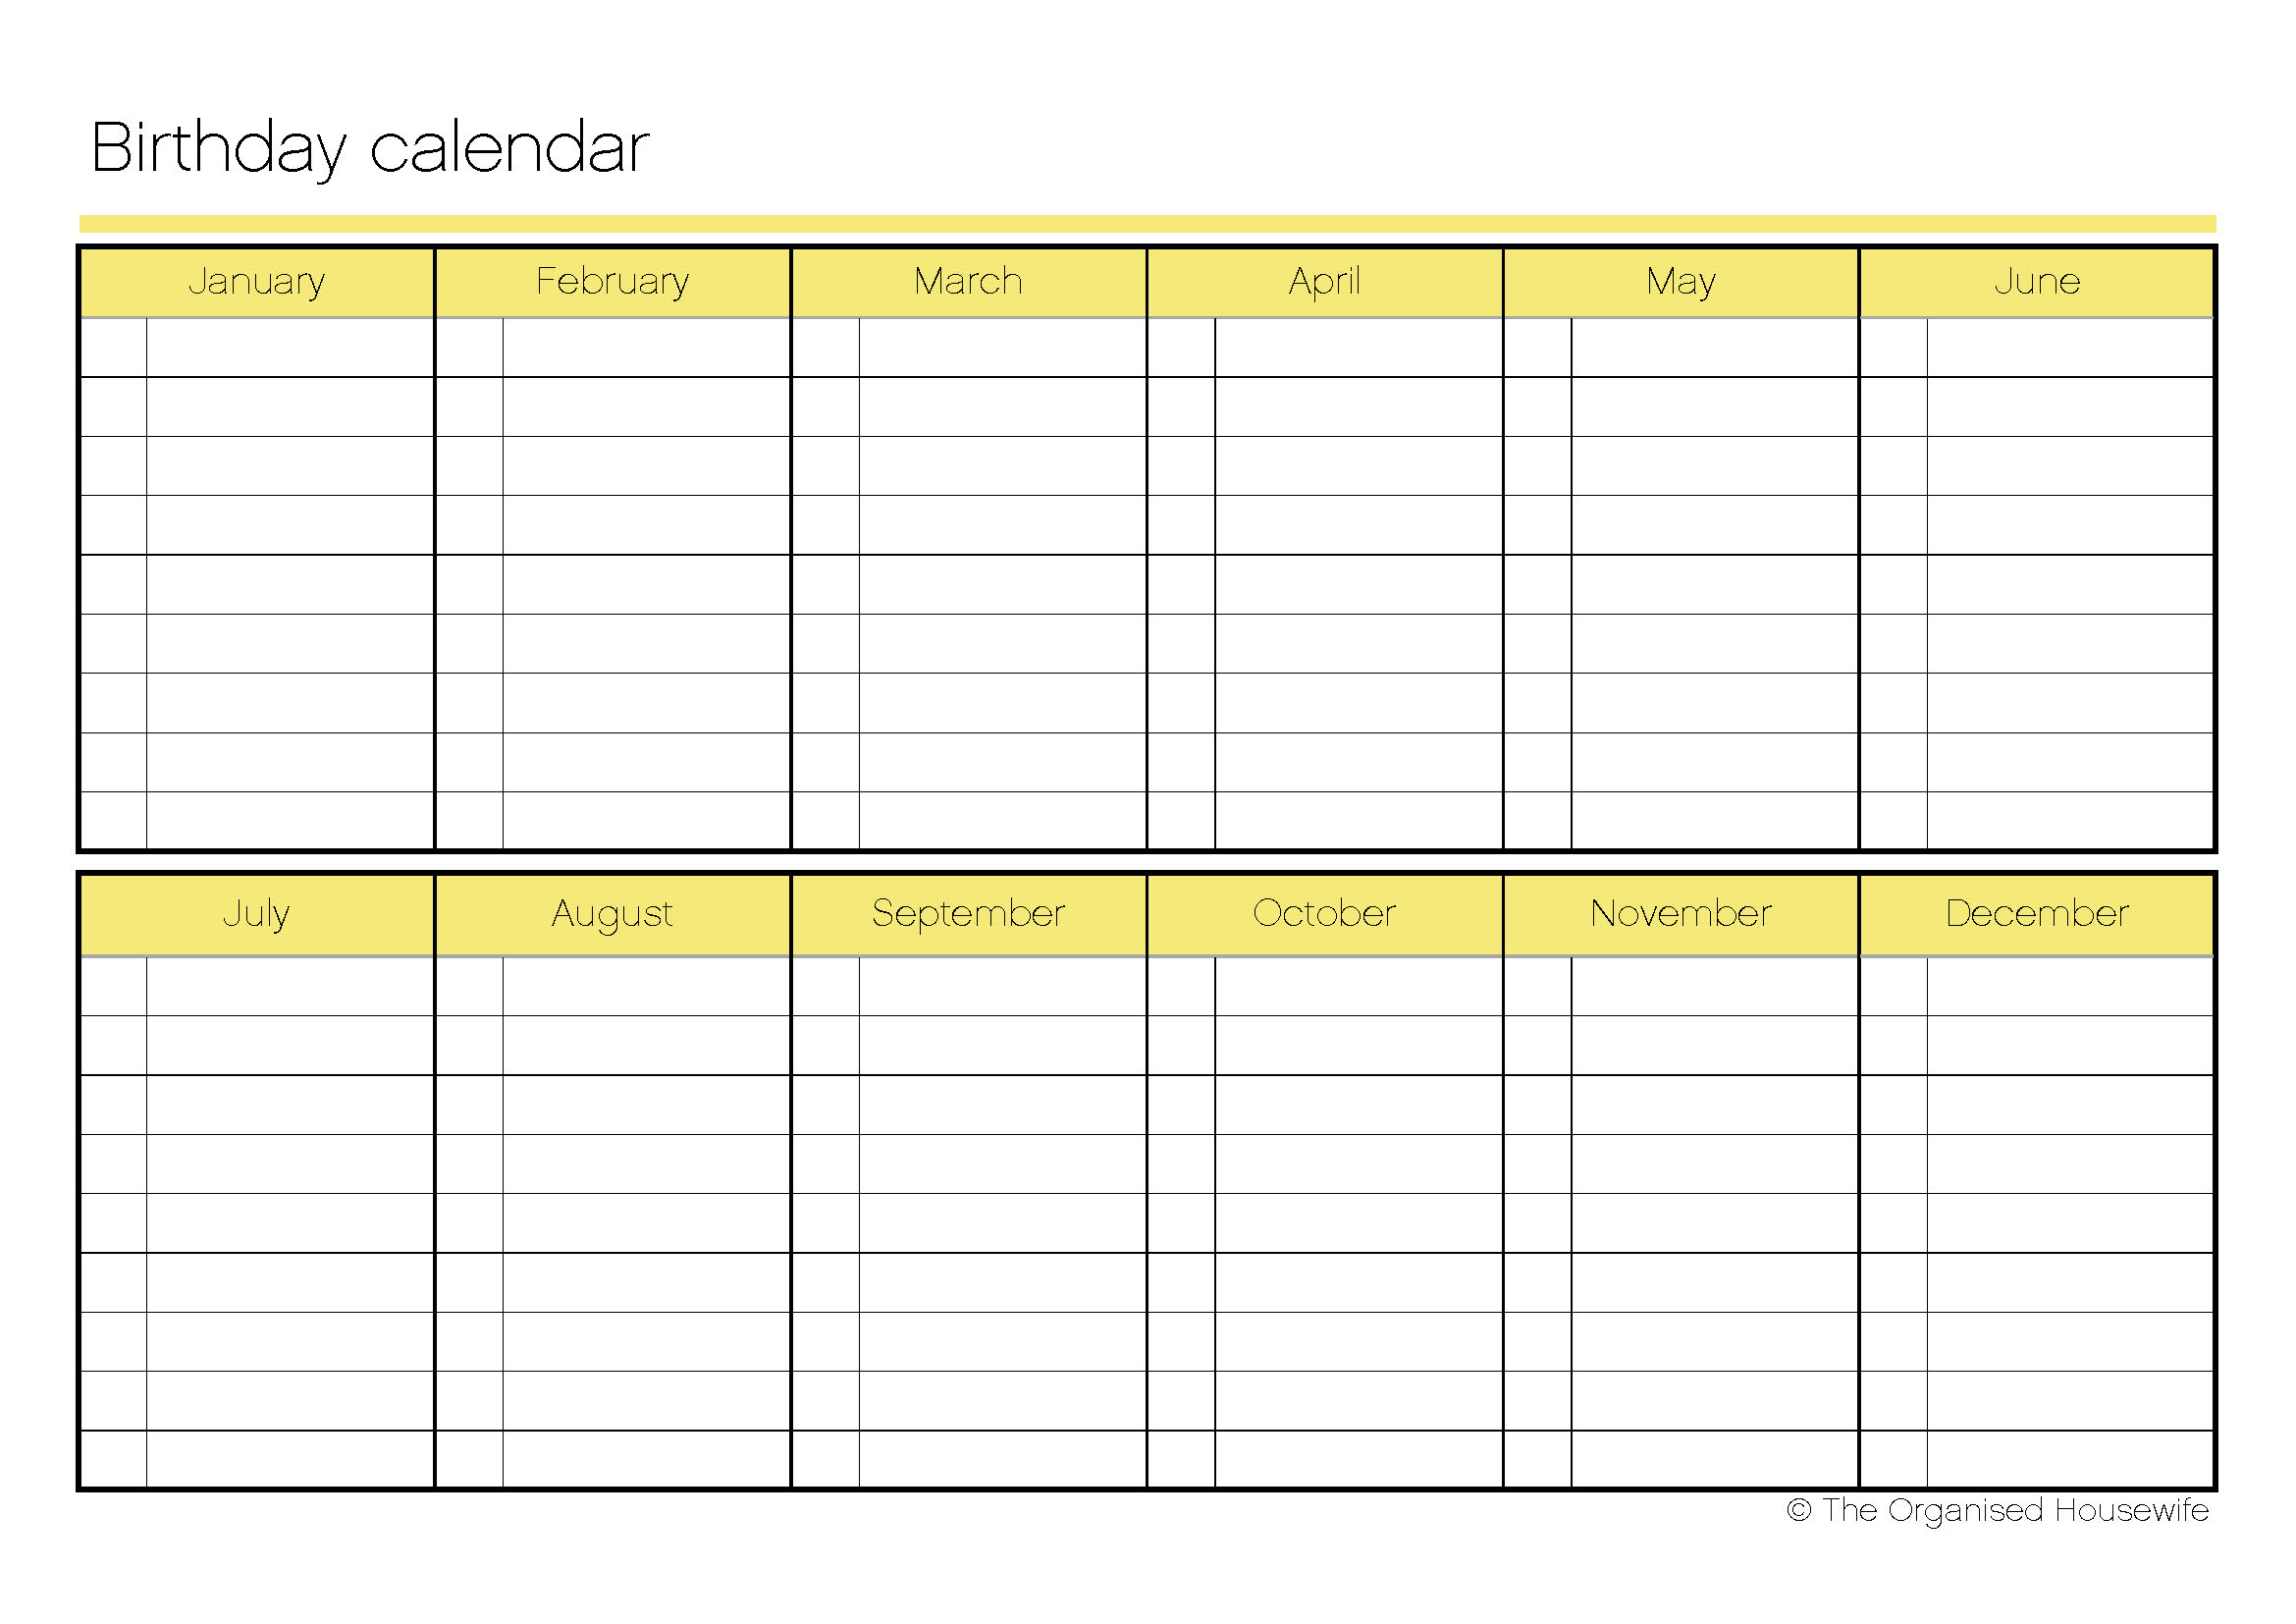 Blank Birthday Calendar : Best images of blank printable birthday calendar free